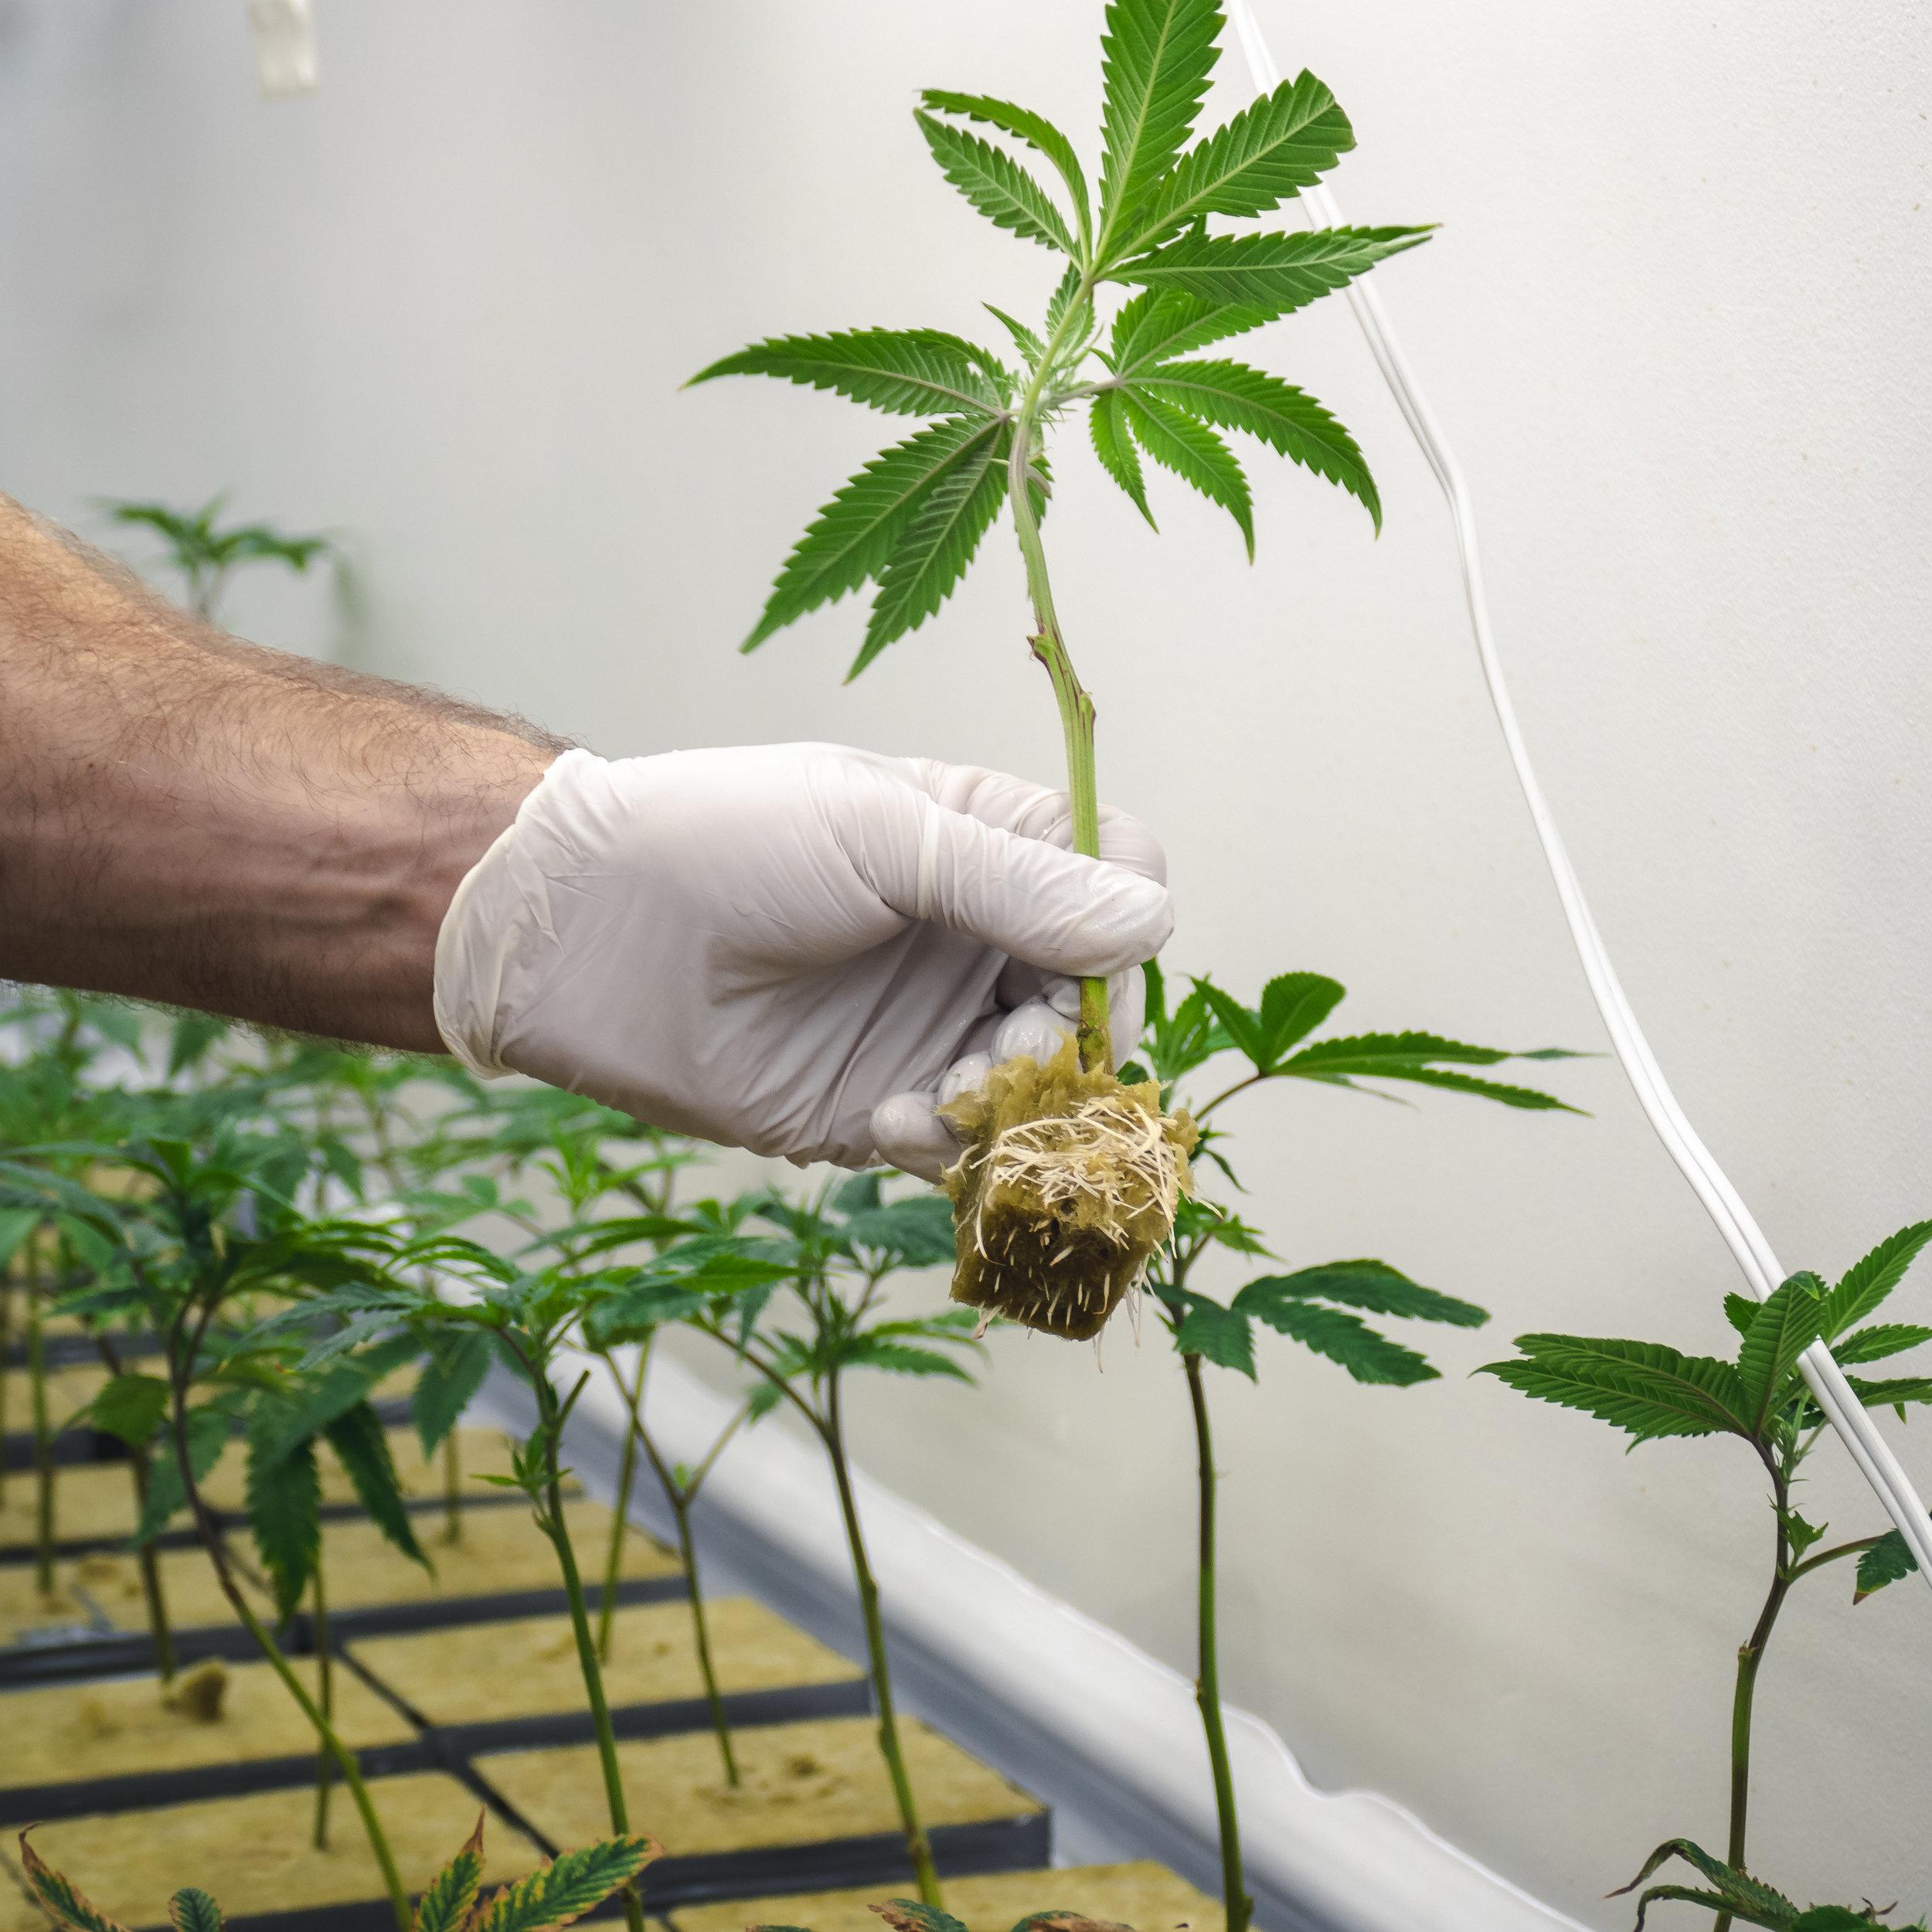 Cannabis_Cultivator_Planting_Baby_Marijuana_Plant_Displaying_Roots.jpg